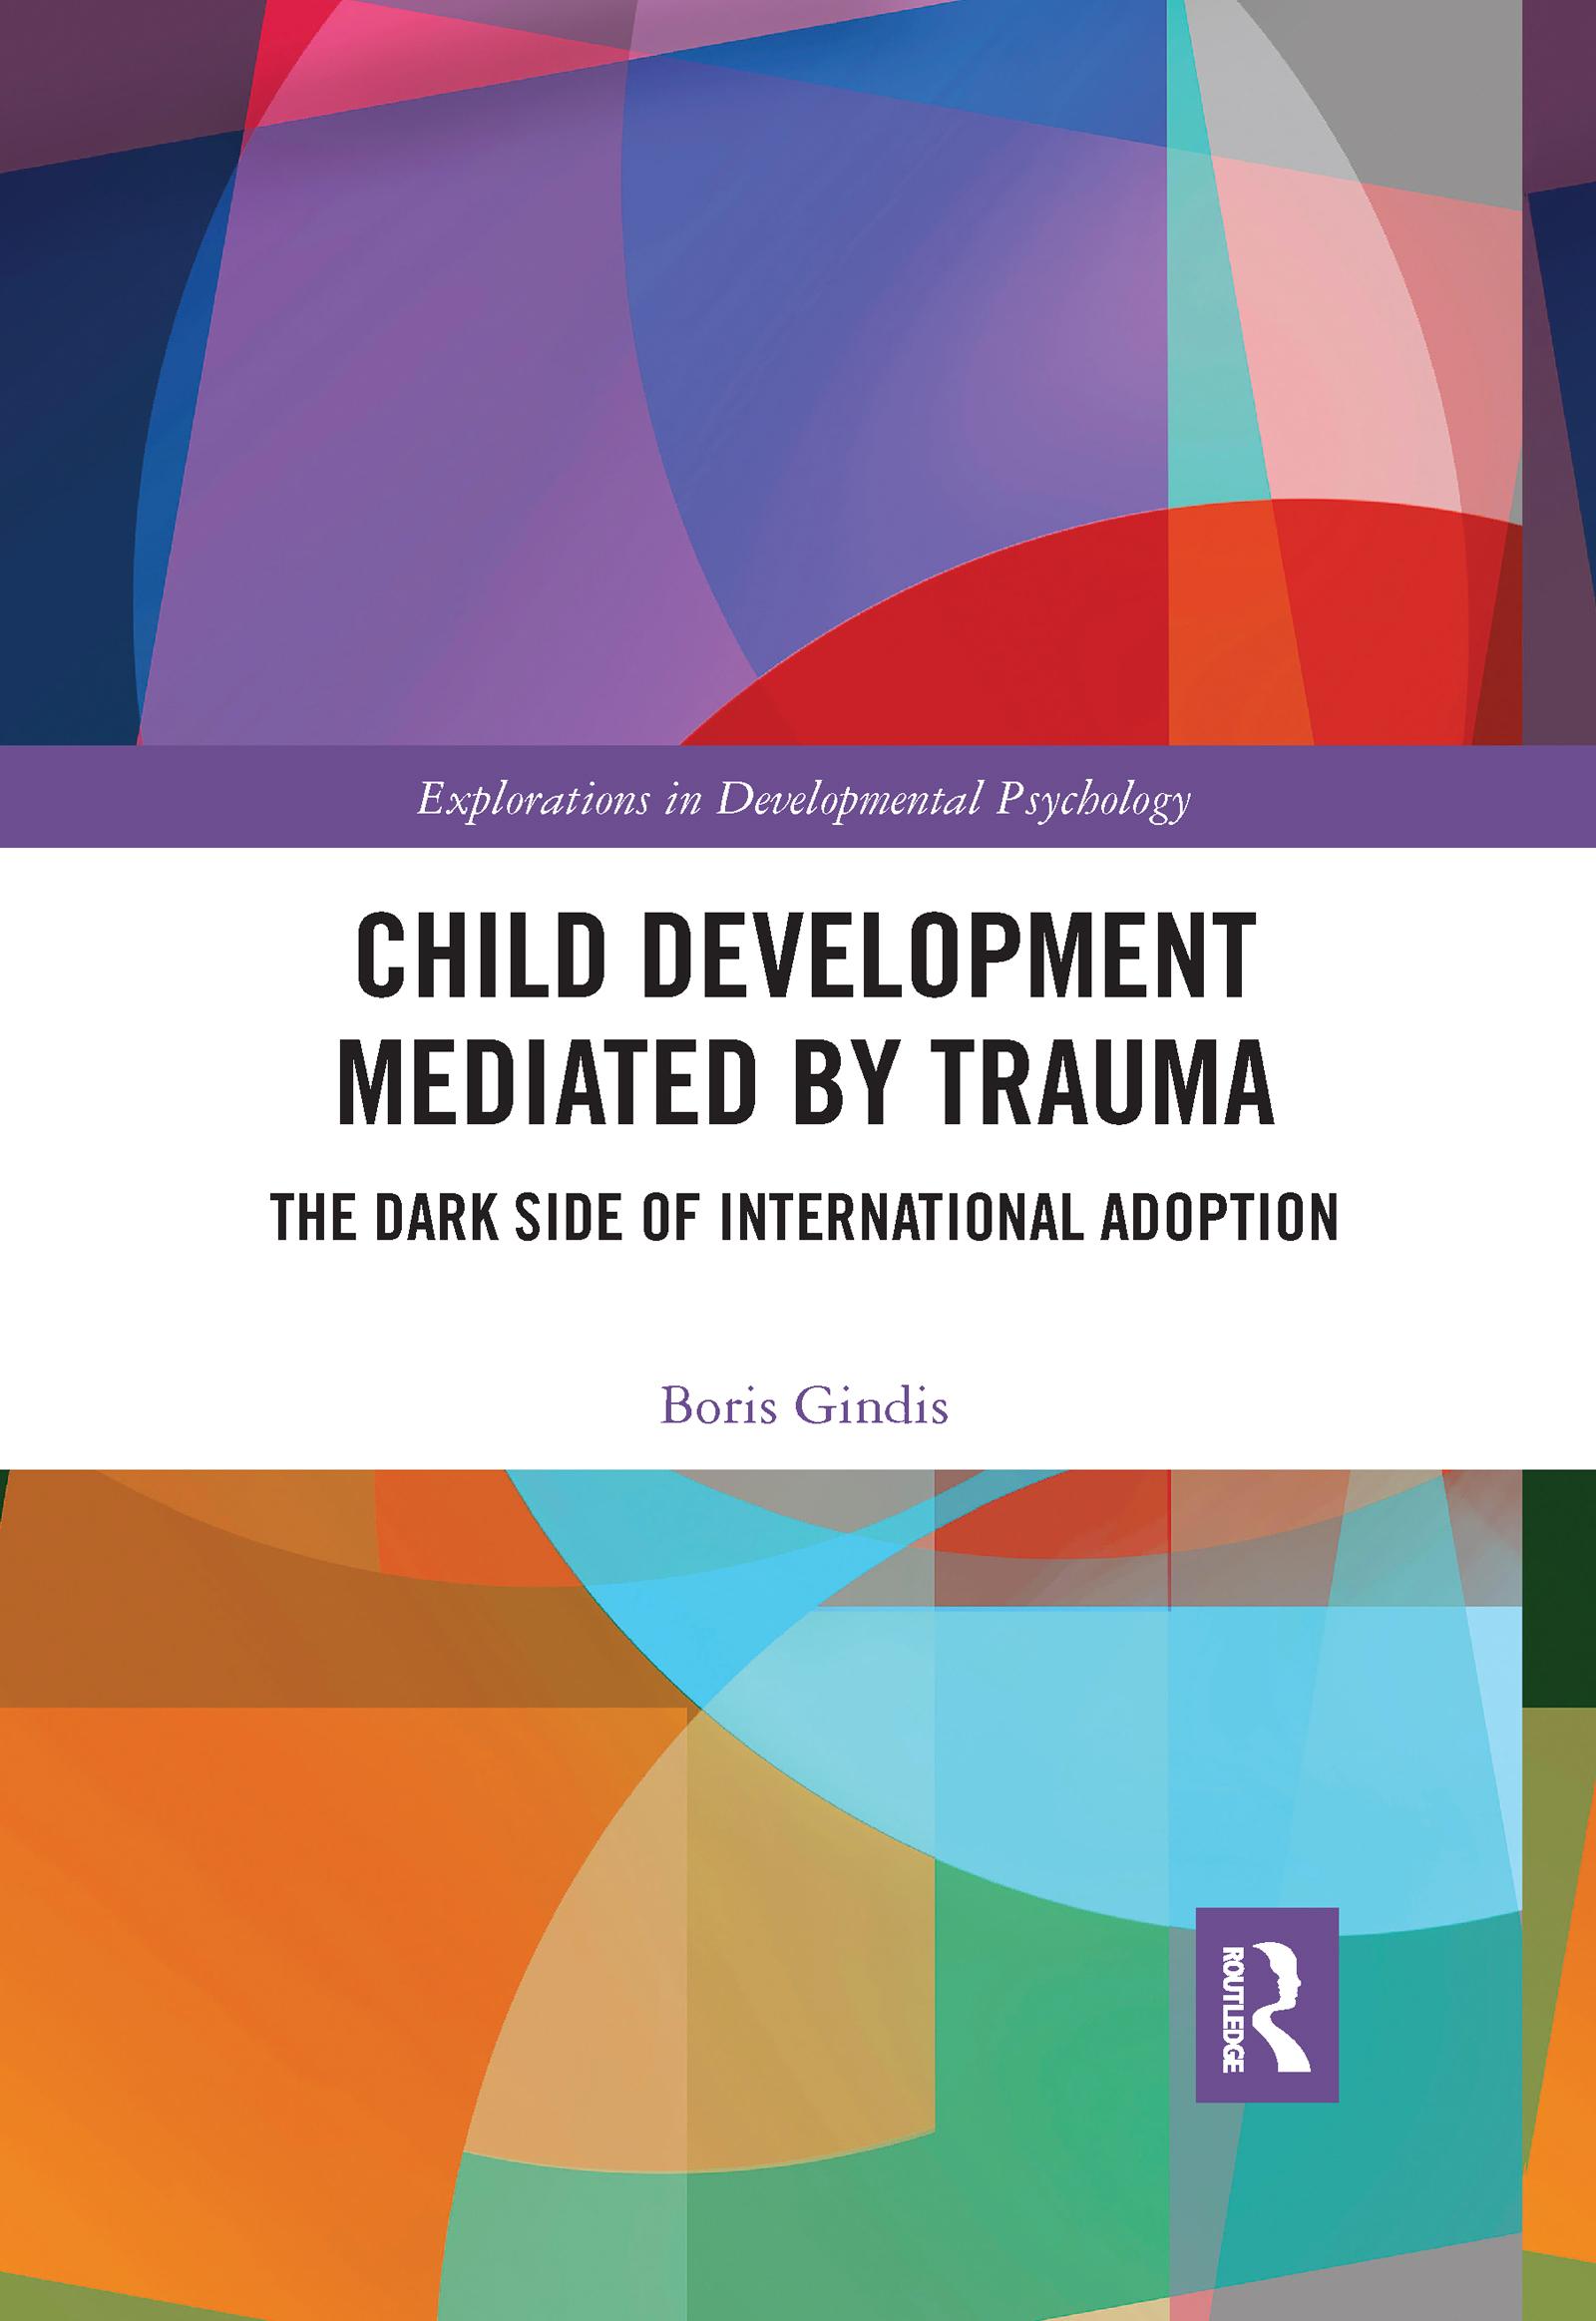 Child Development Mediated by Trauma